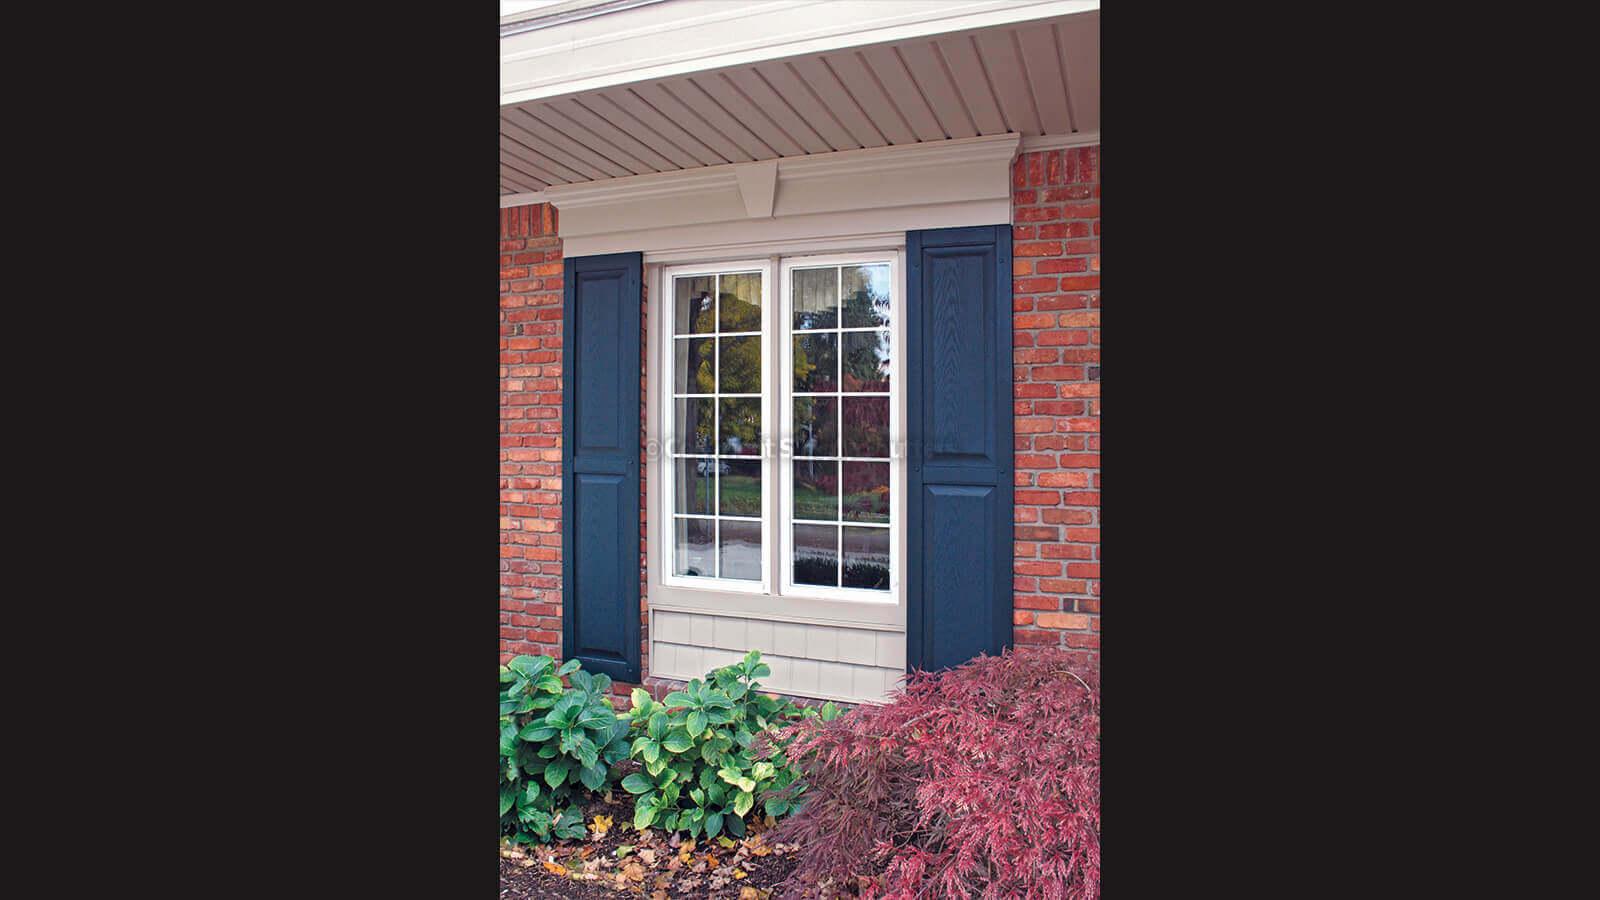 Custom panel decorative exterior window shutters simply - Decorative window shutters exterior ...